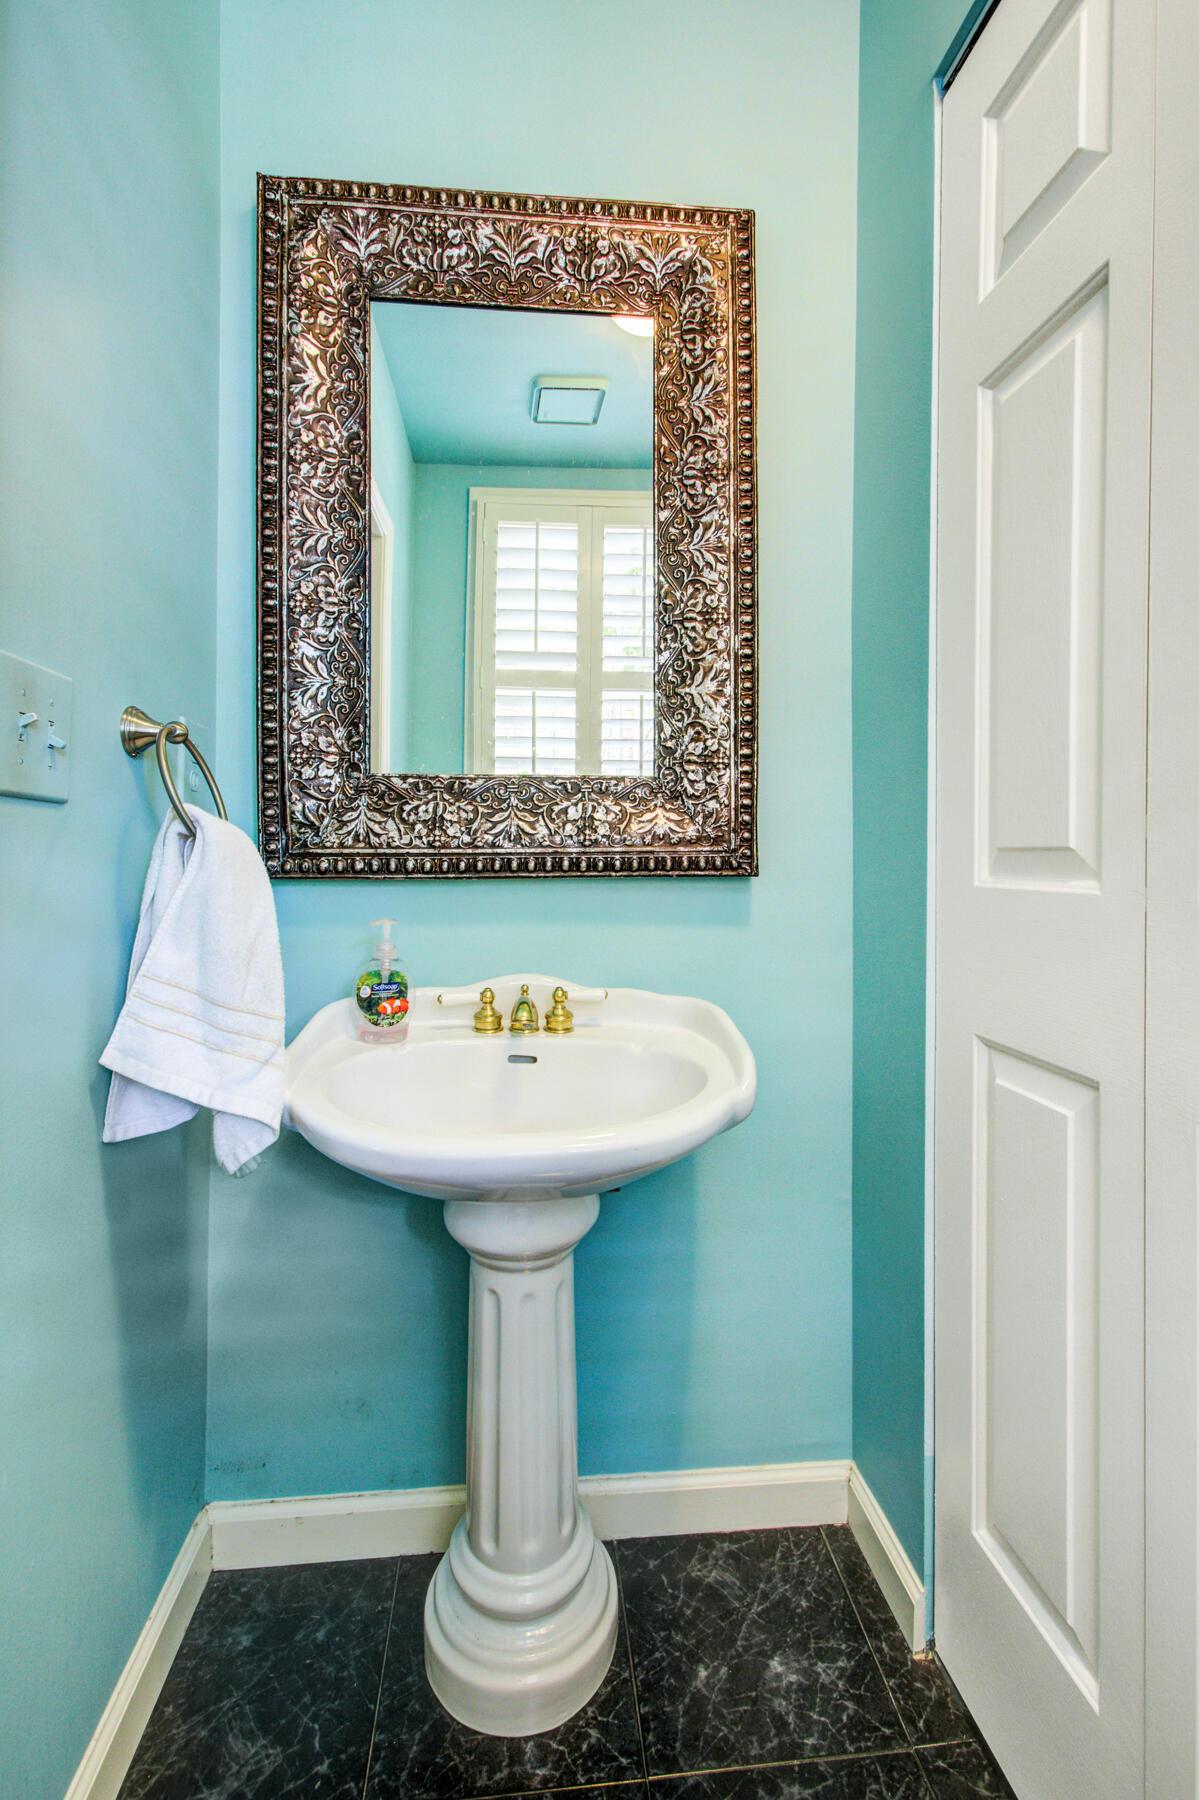 Radcliffeborough Homes For Sale - 48 Radcliffe, Charleston, SC - 6